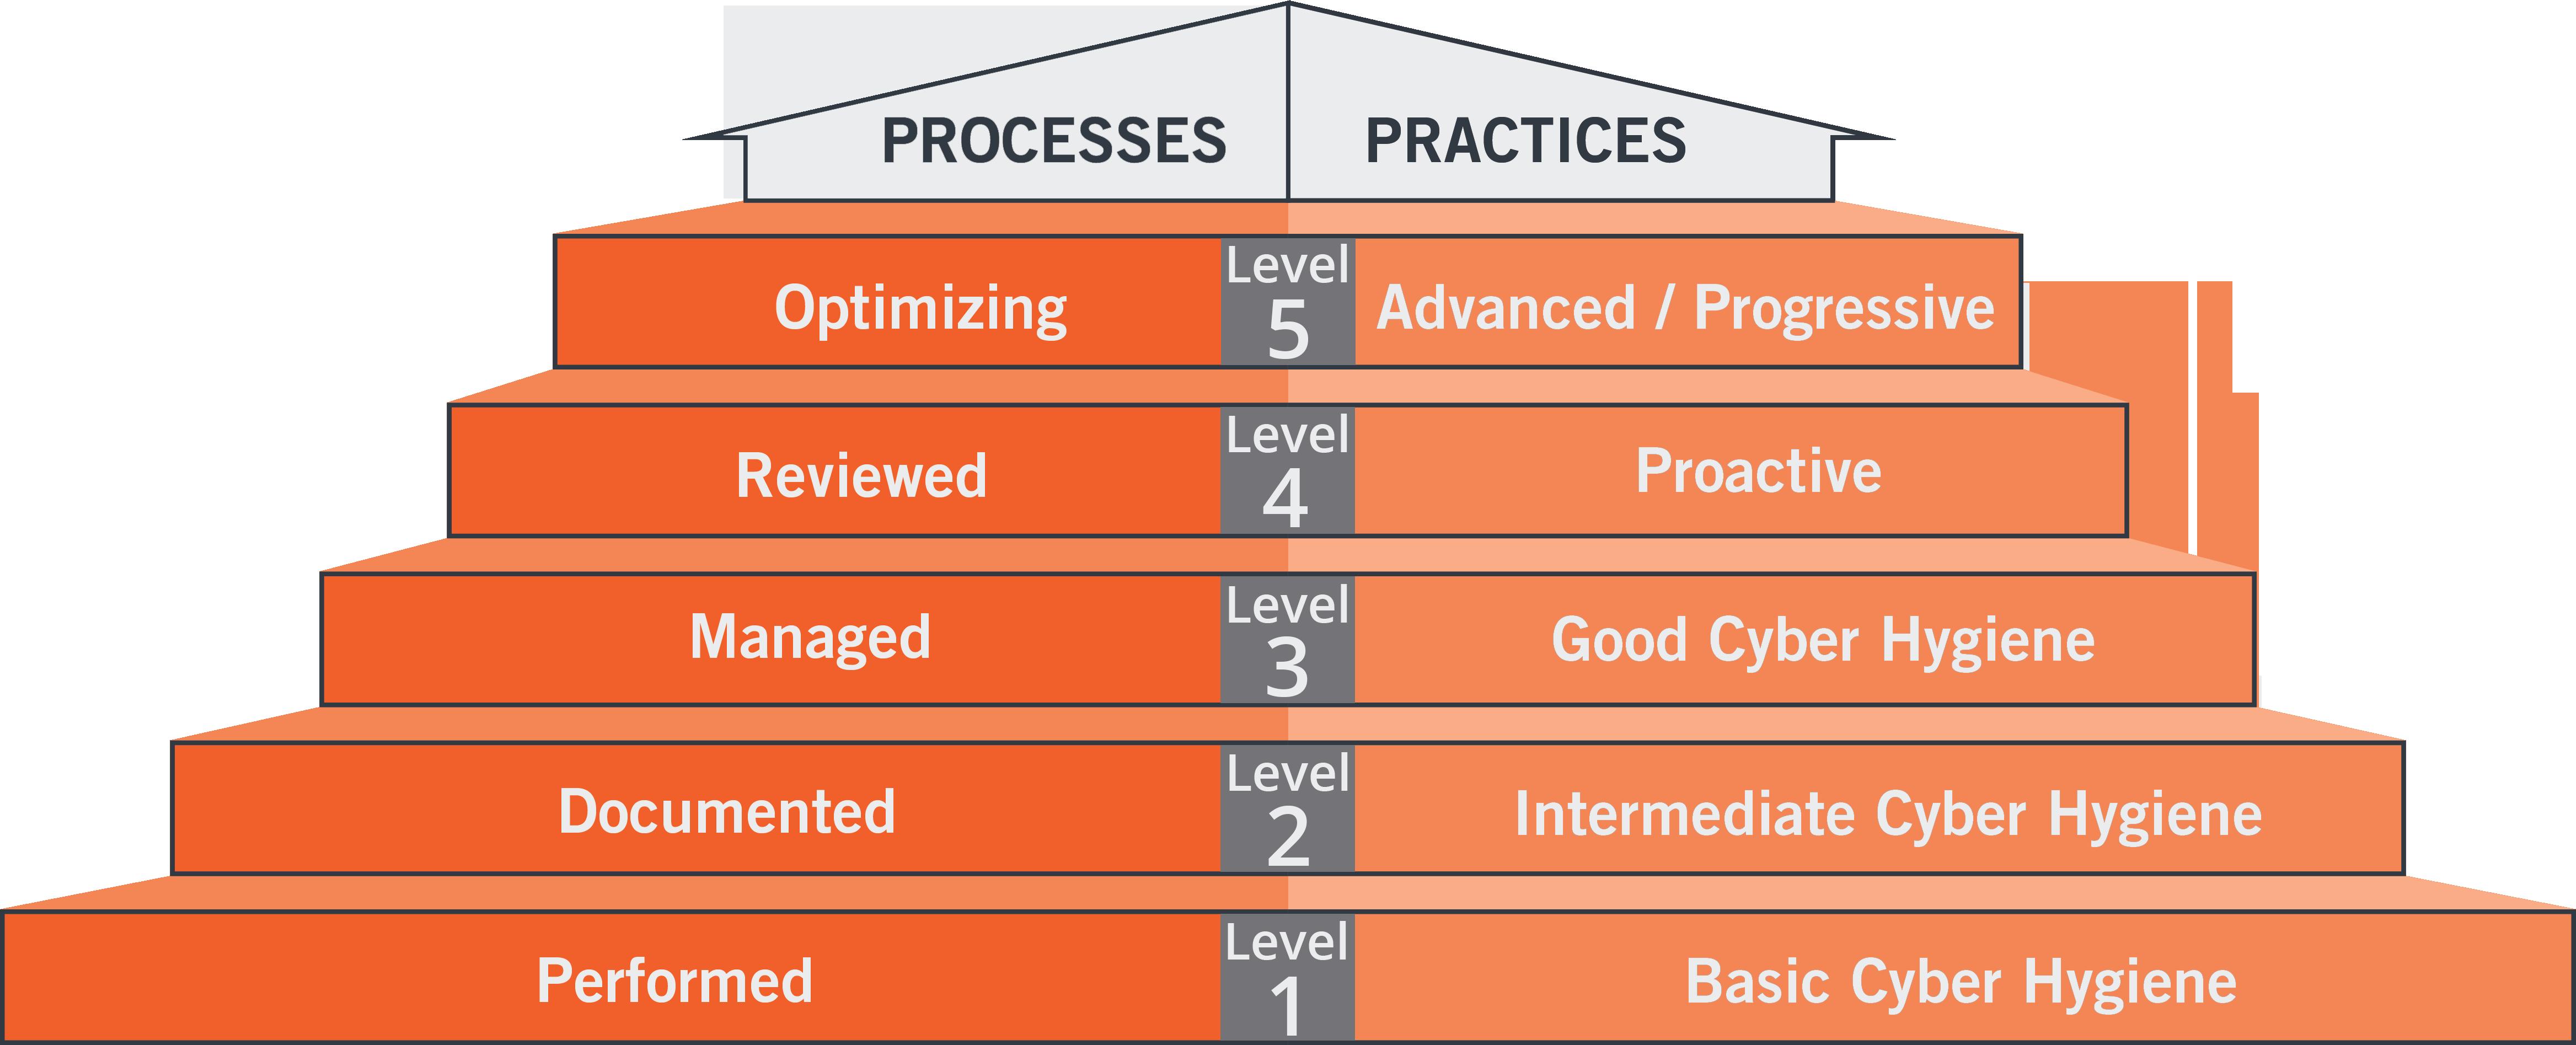 CMMC_Maturity Levels_Processes_Practices.png